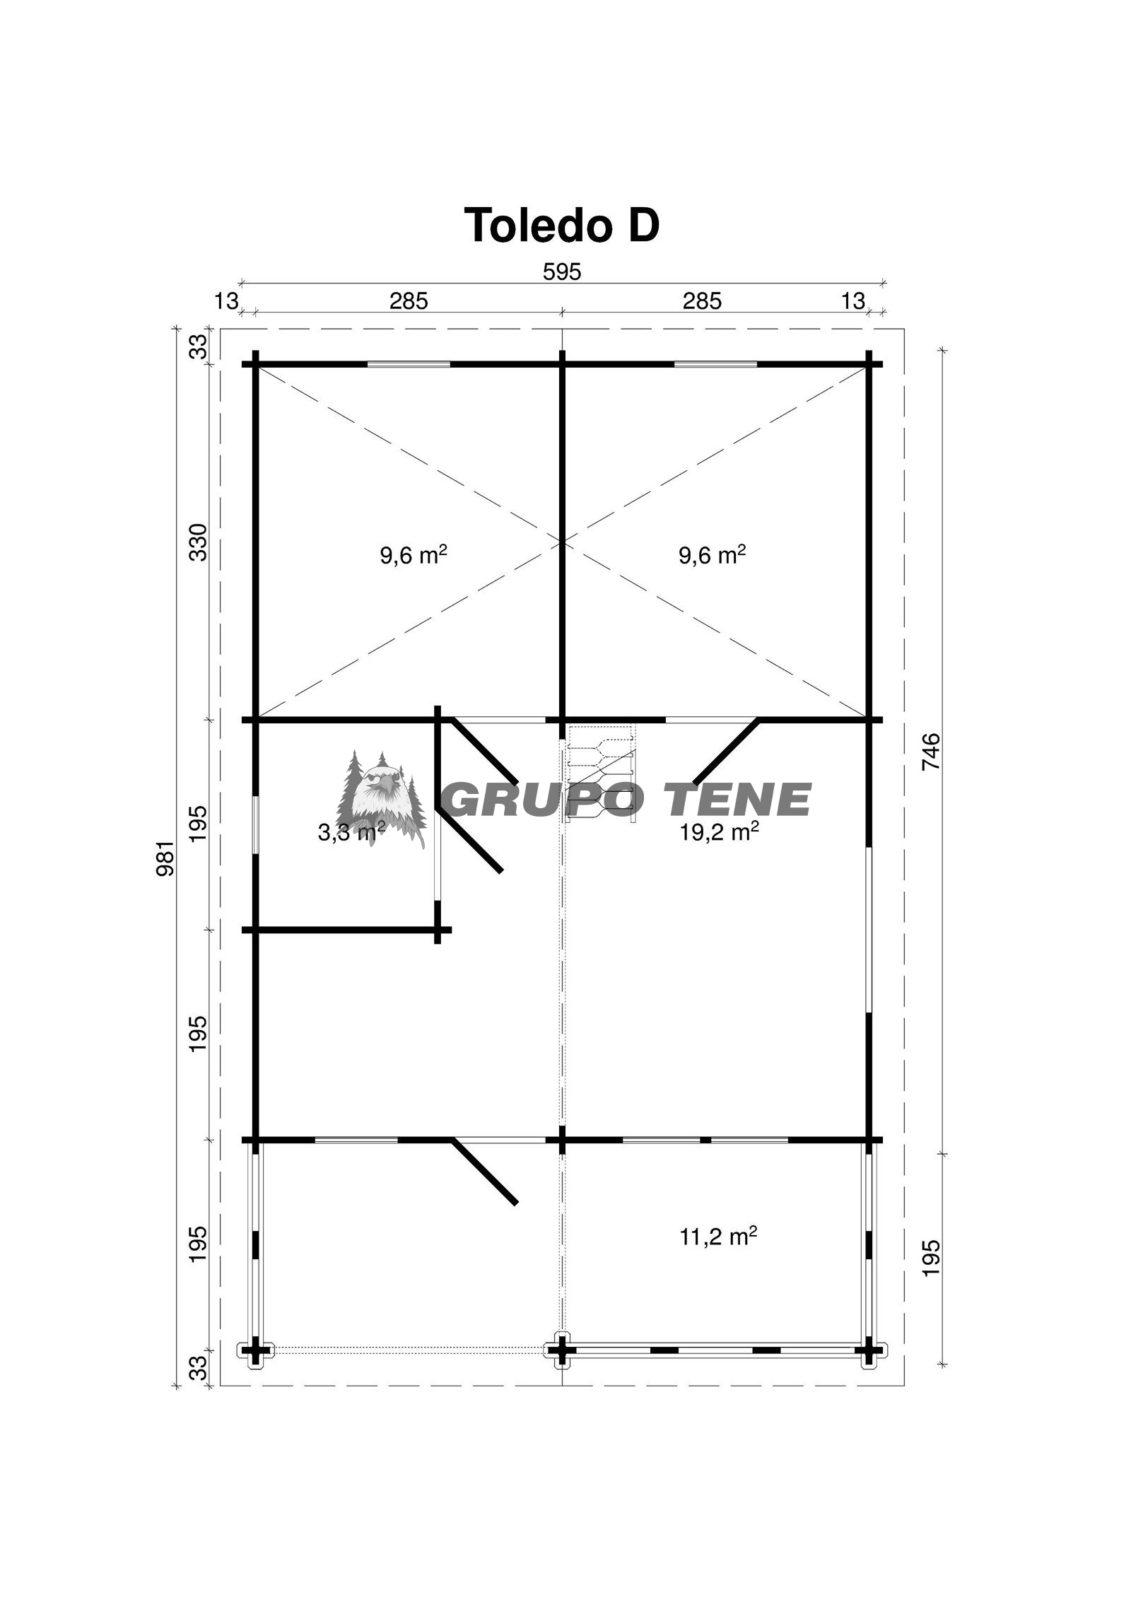 58-70-Toledo-D-1131x1600